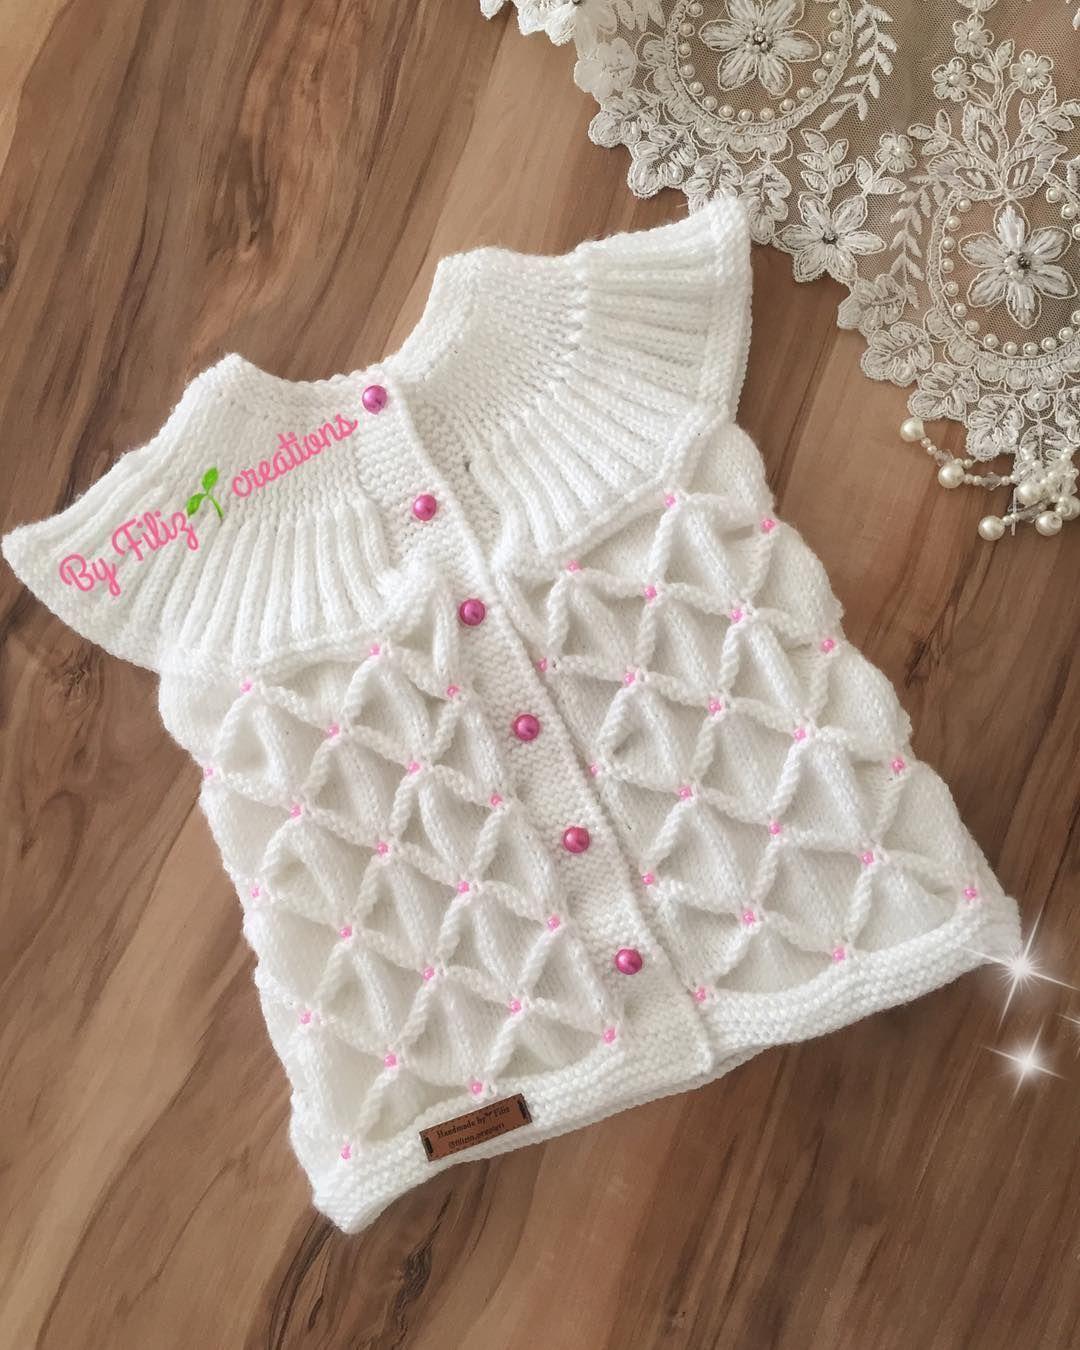 Pin By Busekivilcim On Detskoe Vyazane In 2020 Baby Vest Vest Pattern Crochet Baby Sweaters